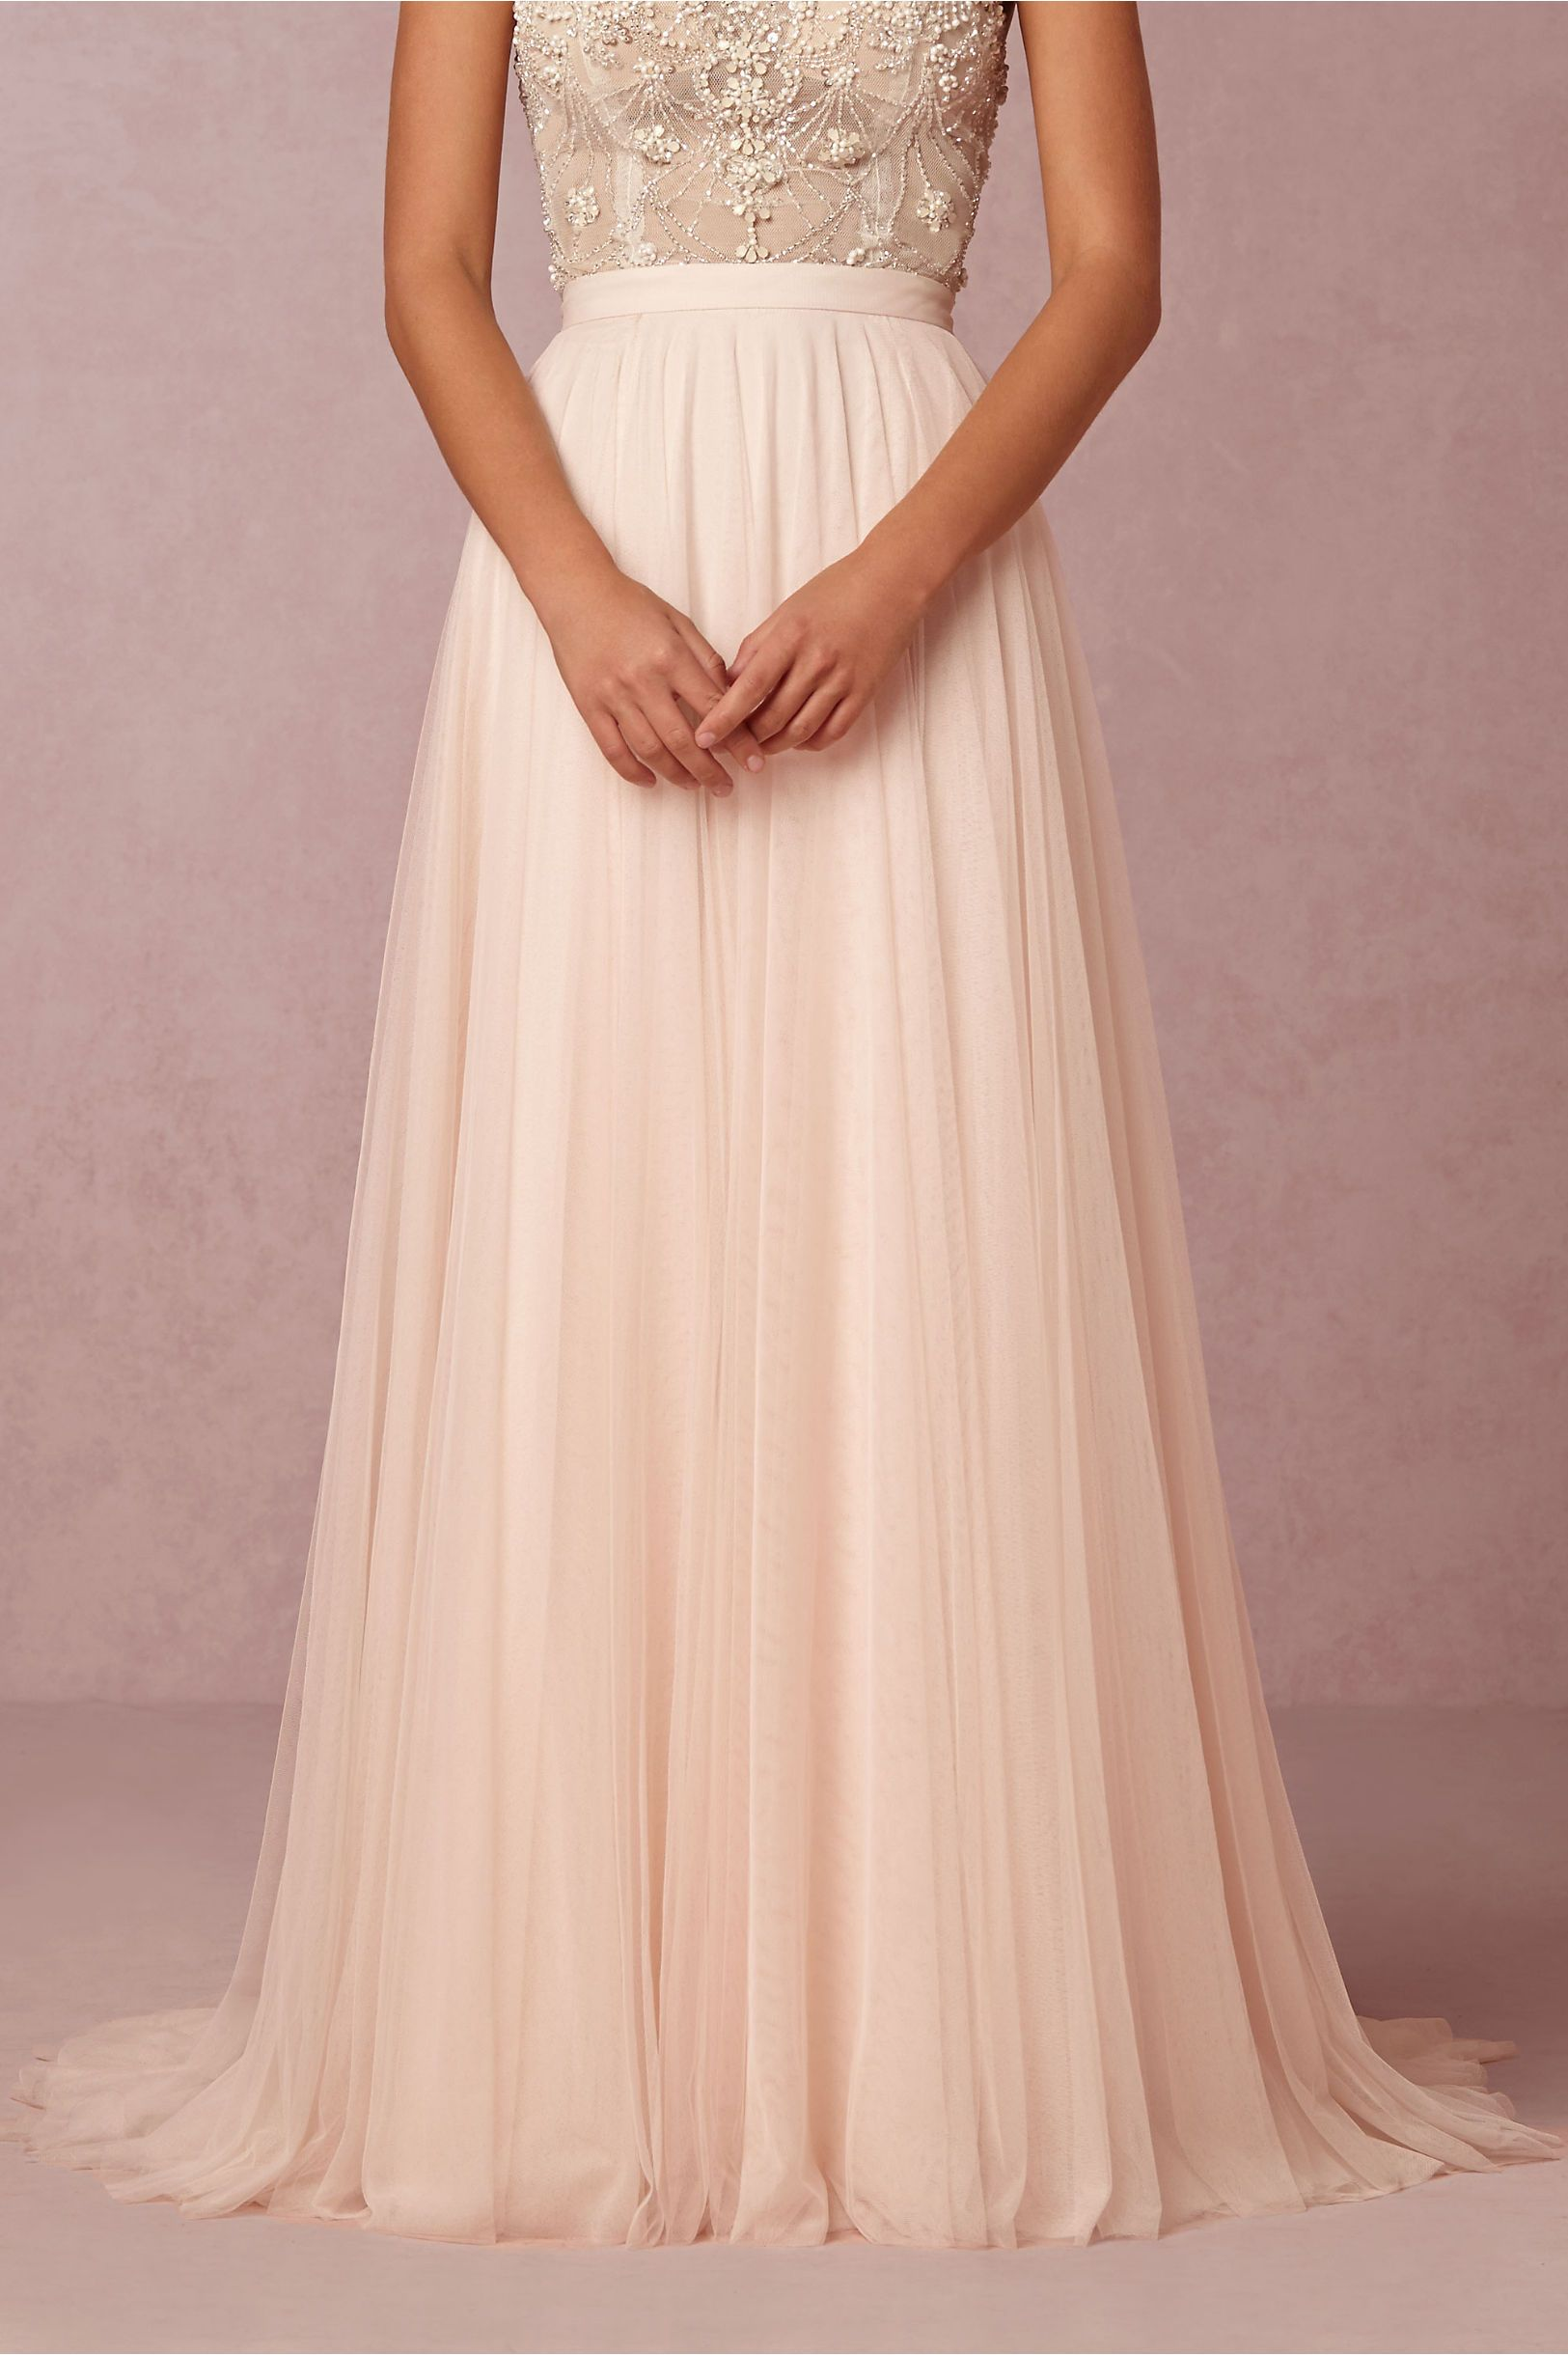 Bhldn ella bodysuit amora skirt in bride bridal separates at ella bodysuit and amora skirt in bride wedding dresses at bhldn ombrellifo Choice Image